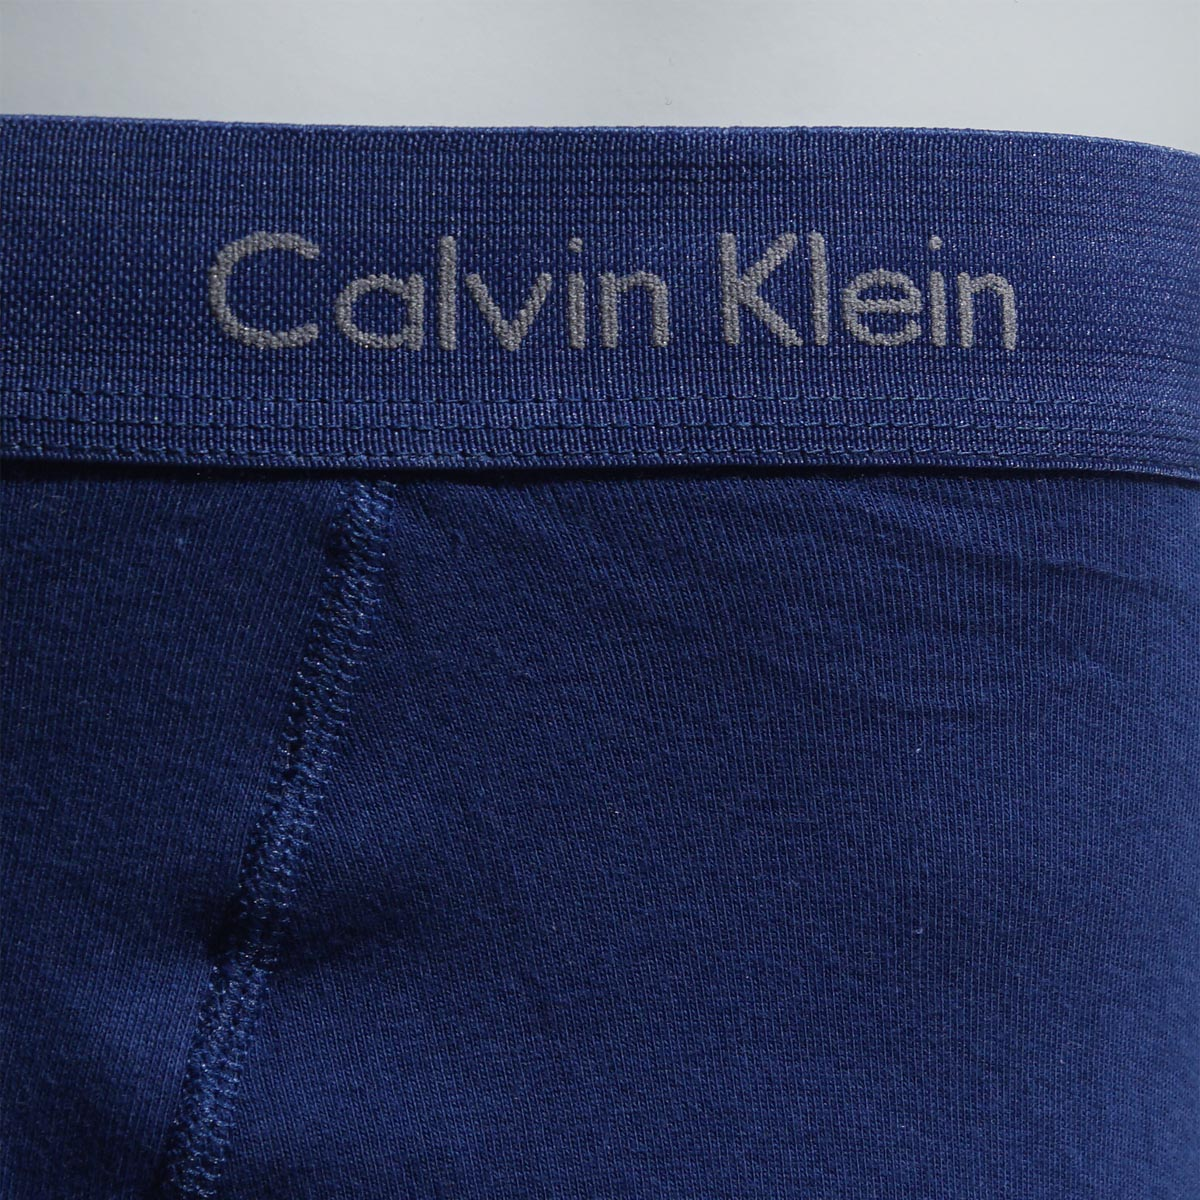 Calvin Klein カルバンクライン ボクサーパンツ 3枚セット/BOXER BRIEFS CLASSIC FIT【返品交換不可】 メンズ